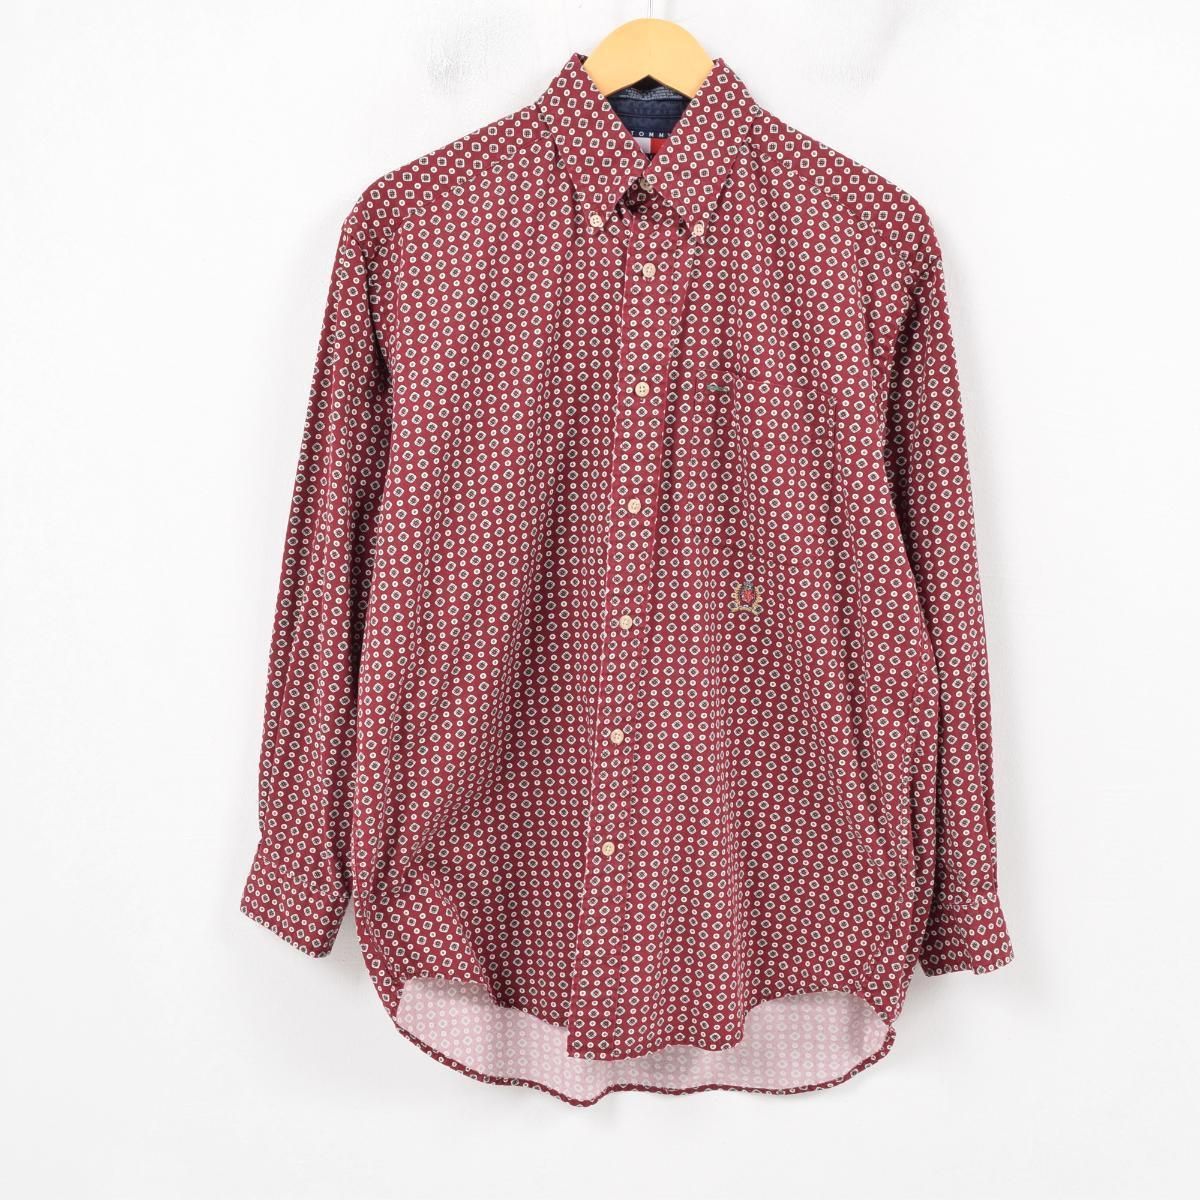 3cb70b40 90s トミーヒルフィガー TOMMY HILFIGER whole pattern long sleeves button-down shirt  men S /wap8205